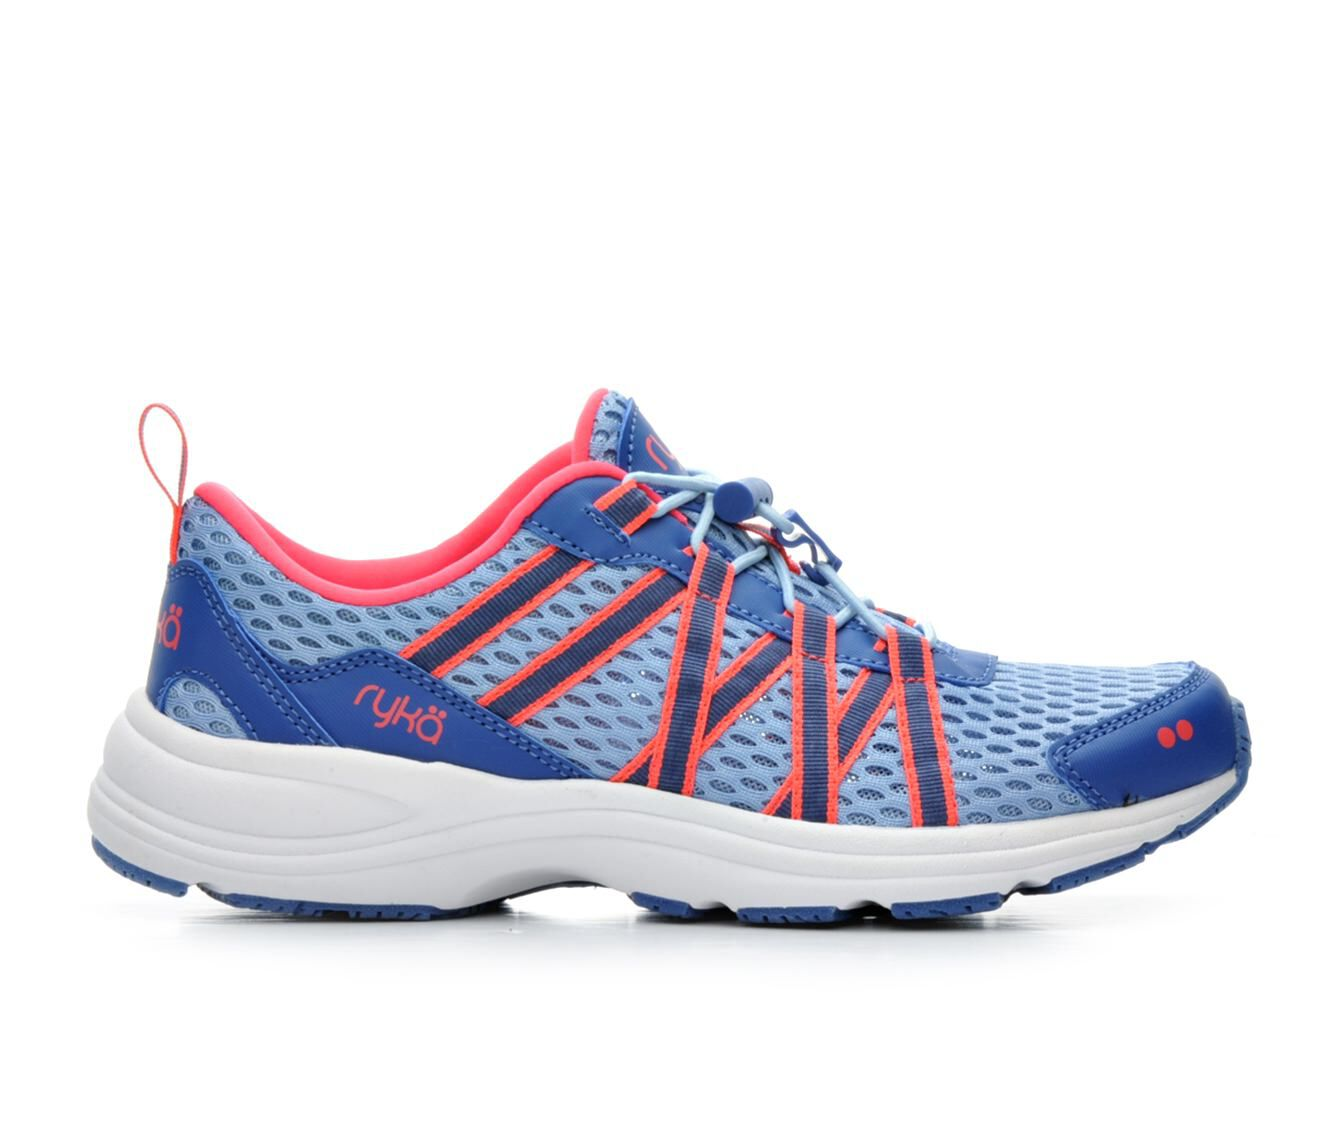 Women's Ryka Aqua Sport Training Shoes Blue/Coral